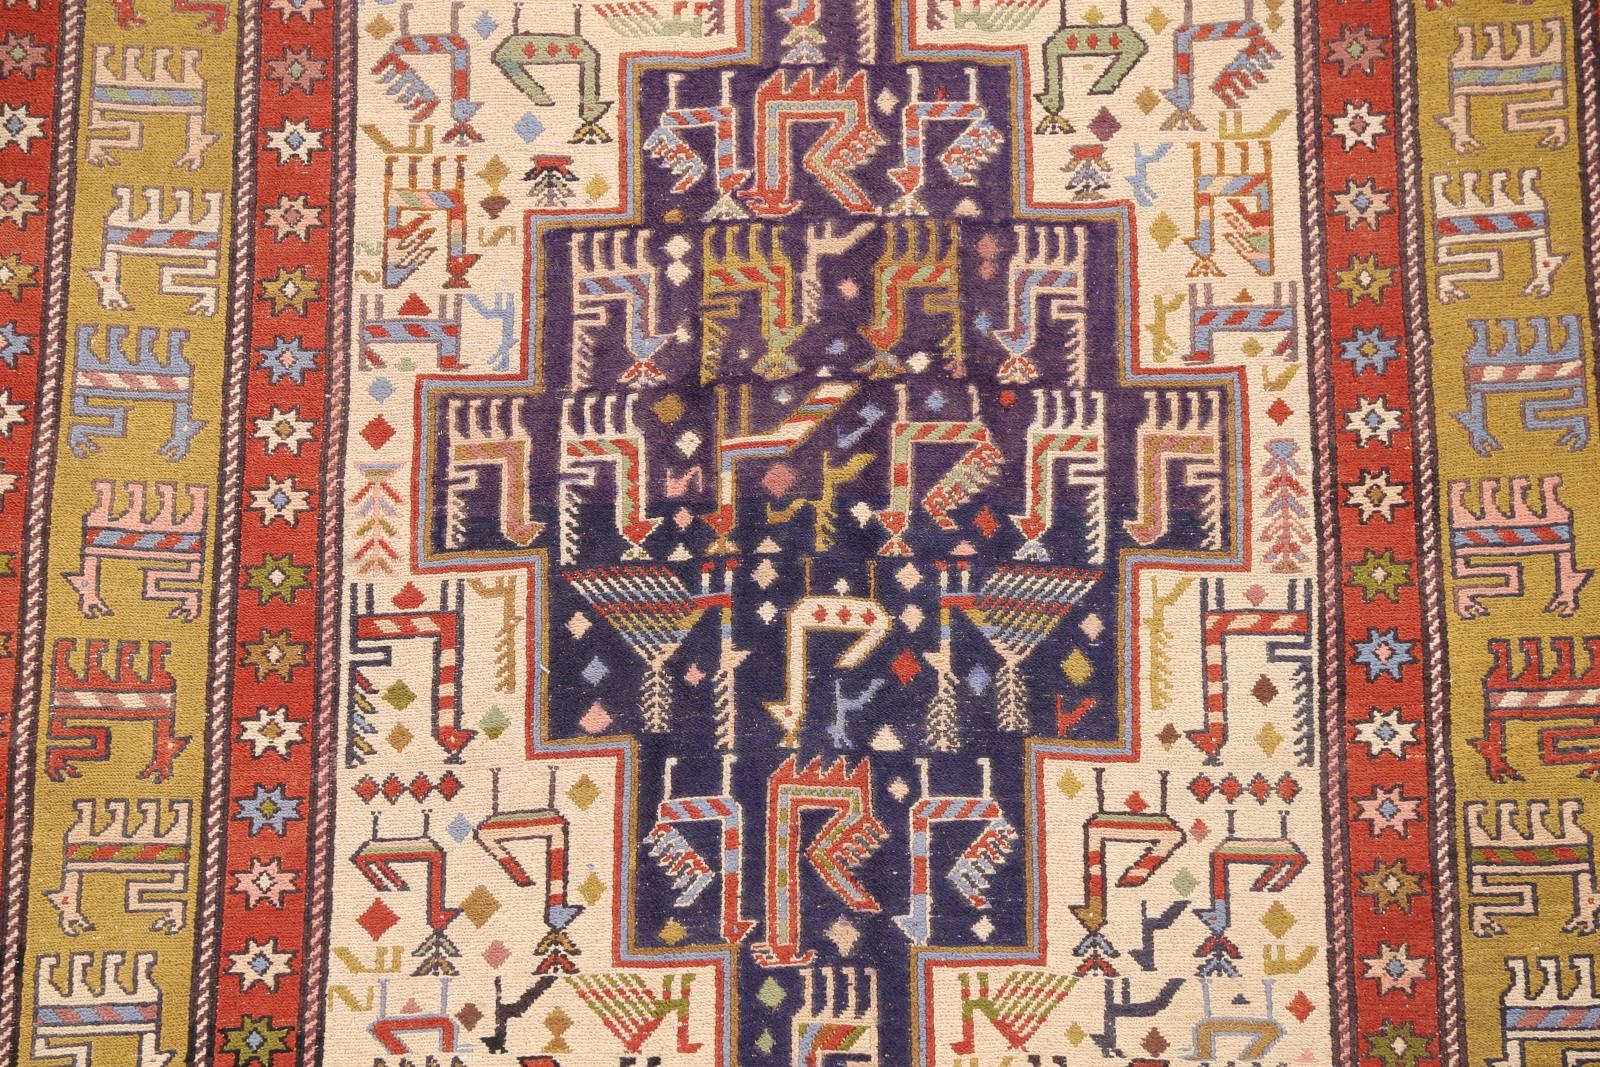 Geometric Tribal Animal Symbol 4x5 Sumak Kilim Persian